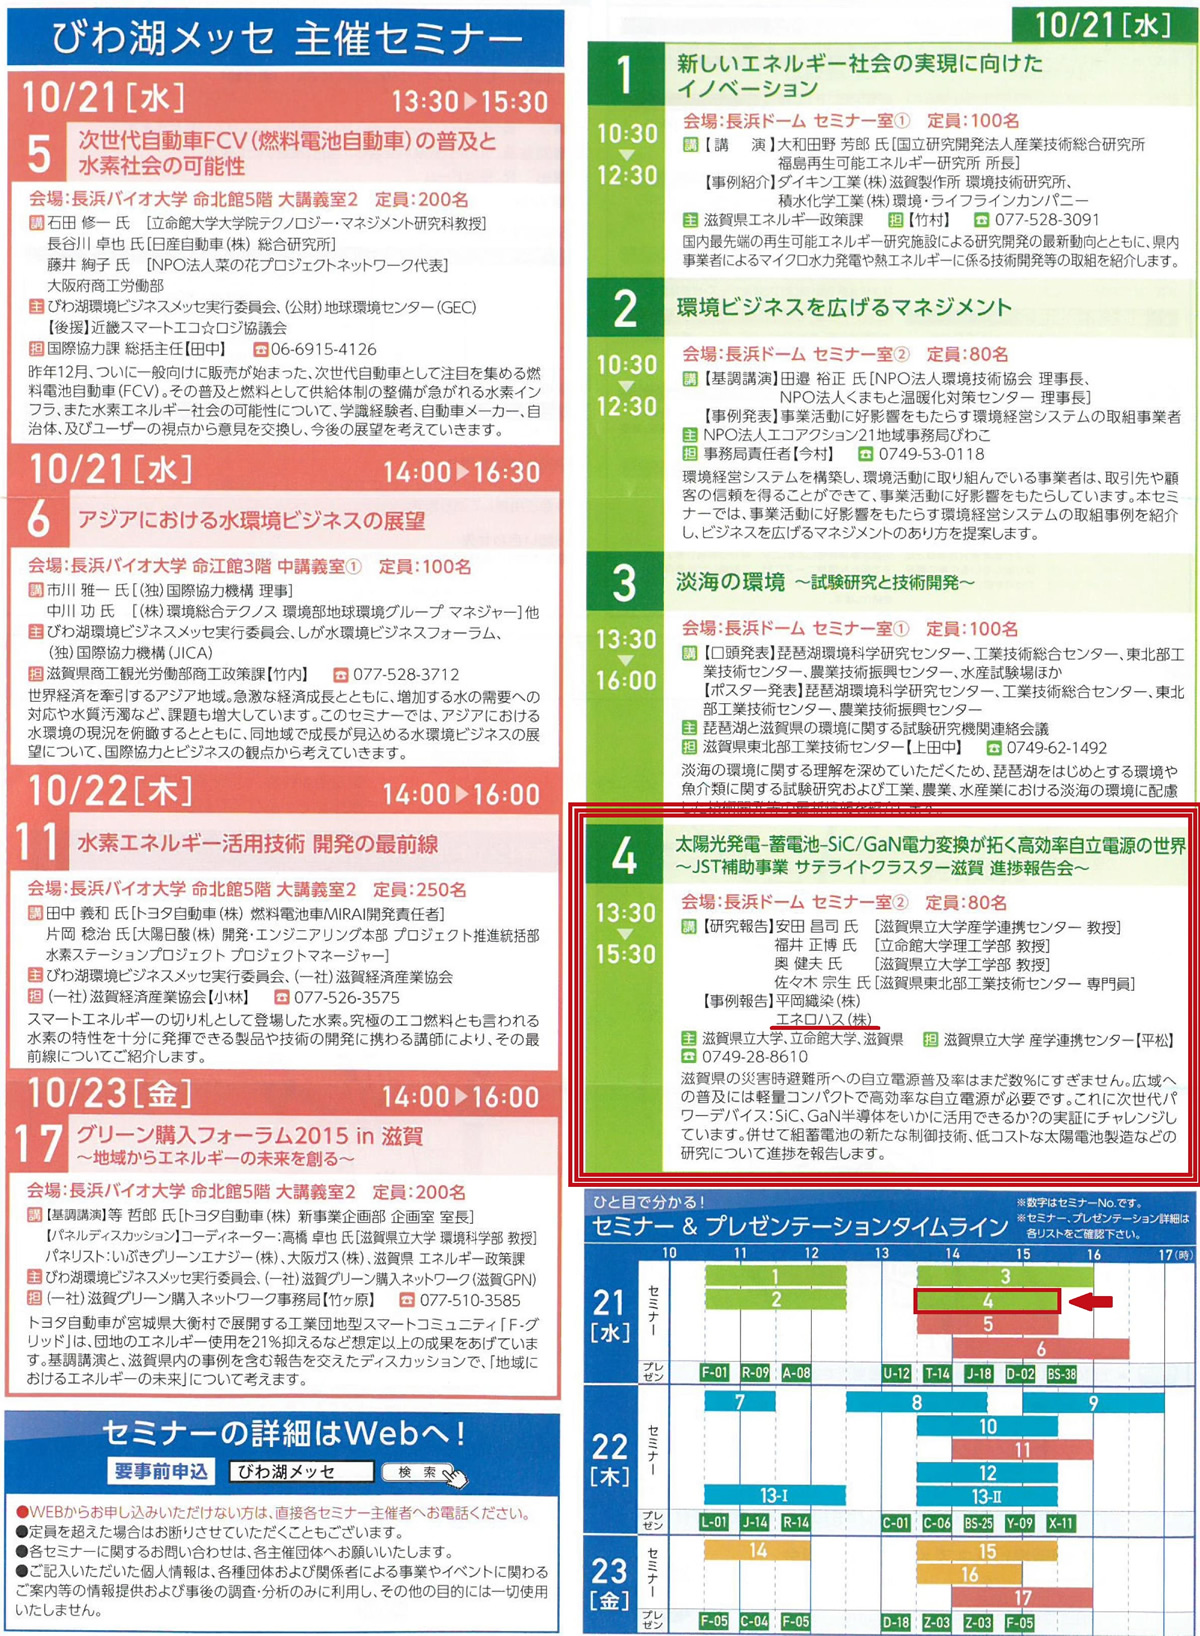 http://www.kairaku-jutaku.co.jp/images/seminer.jpg